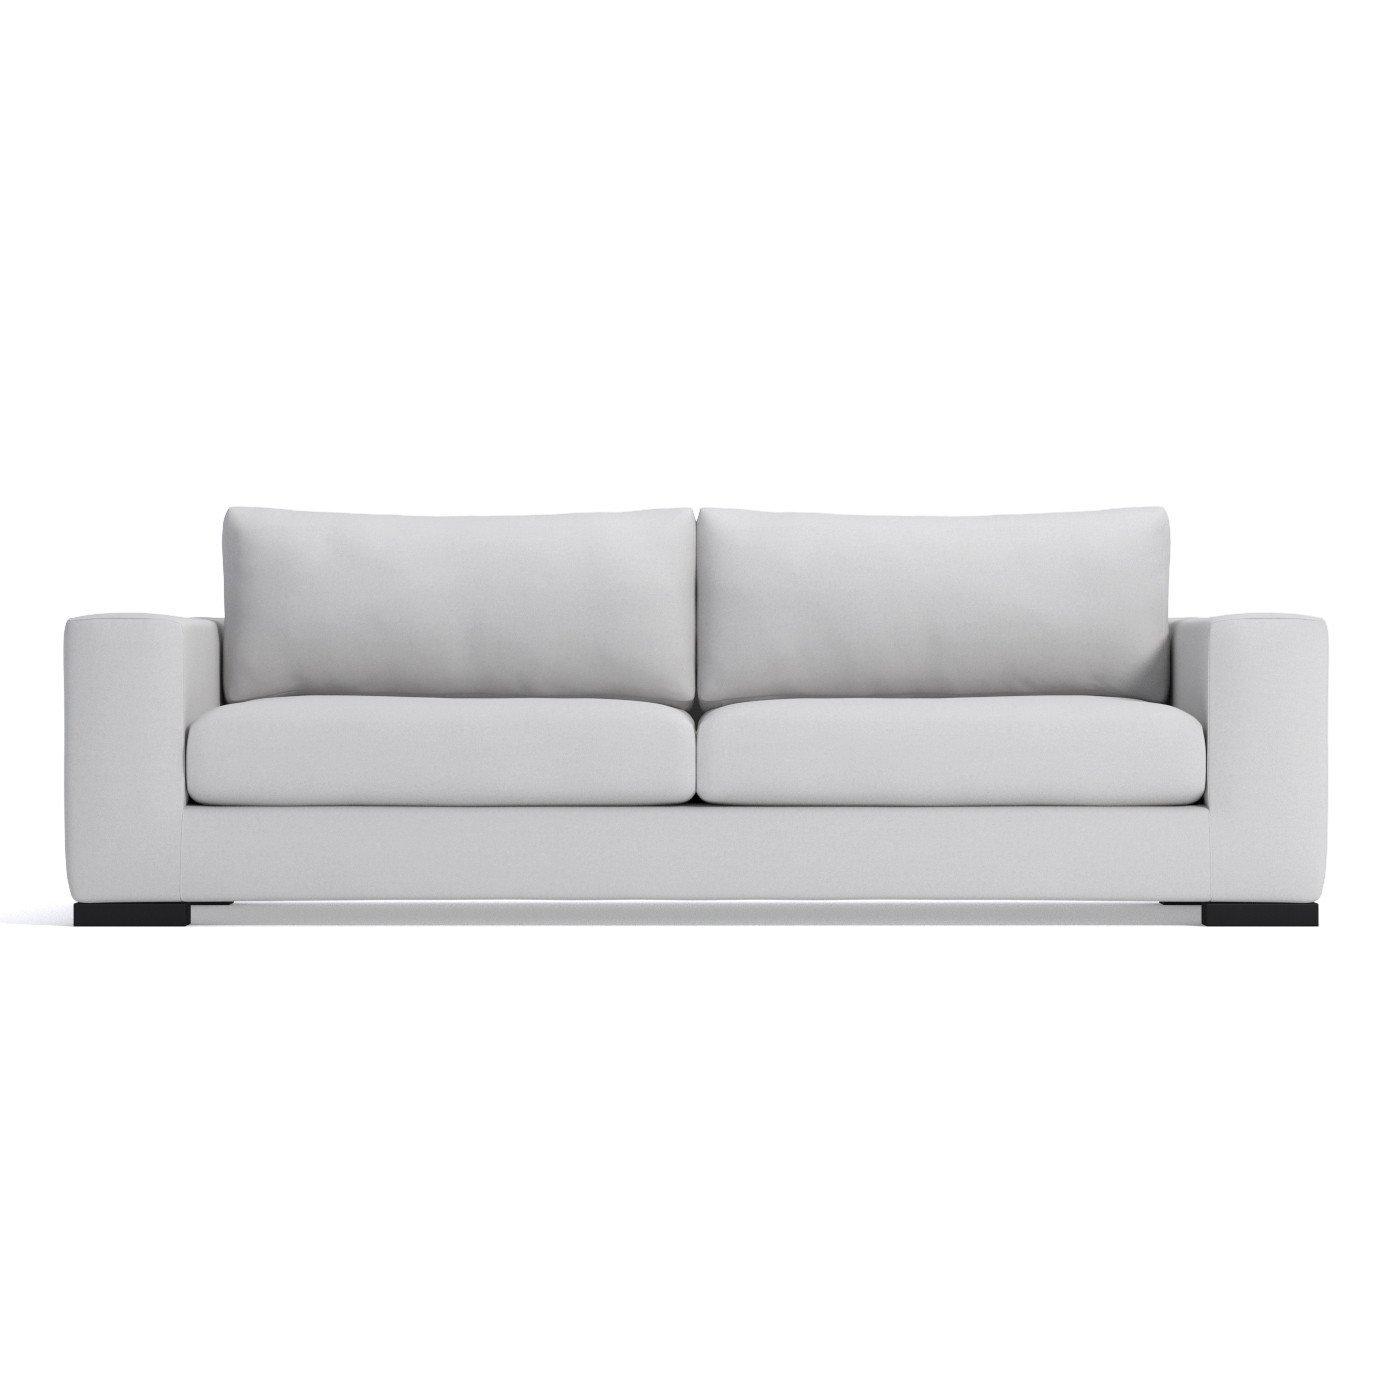 Pleasing Amazon Com Hillandale Sofa Stone Kitchen Dining Short Links Chair Design For Home Short Linksinfo